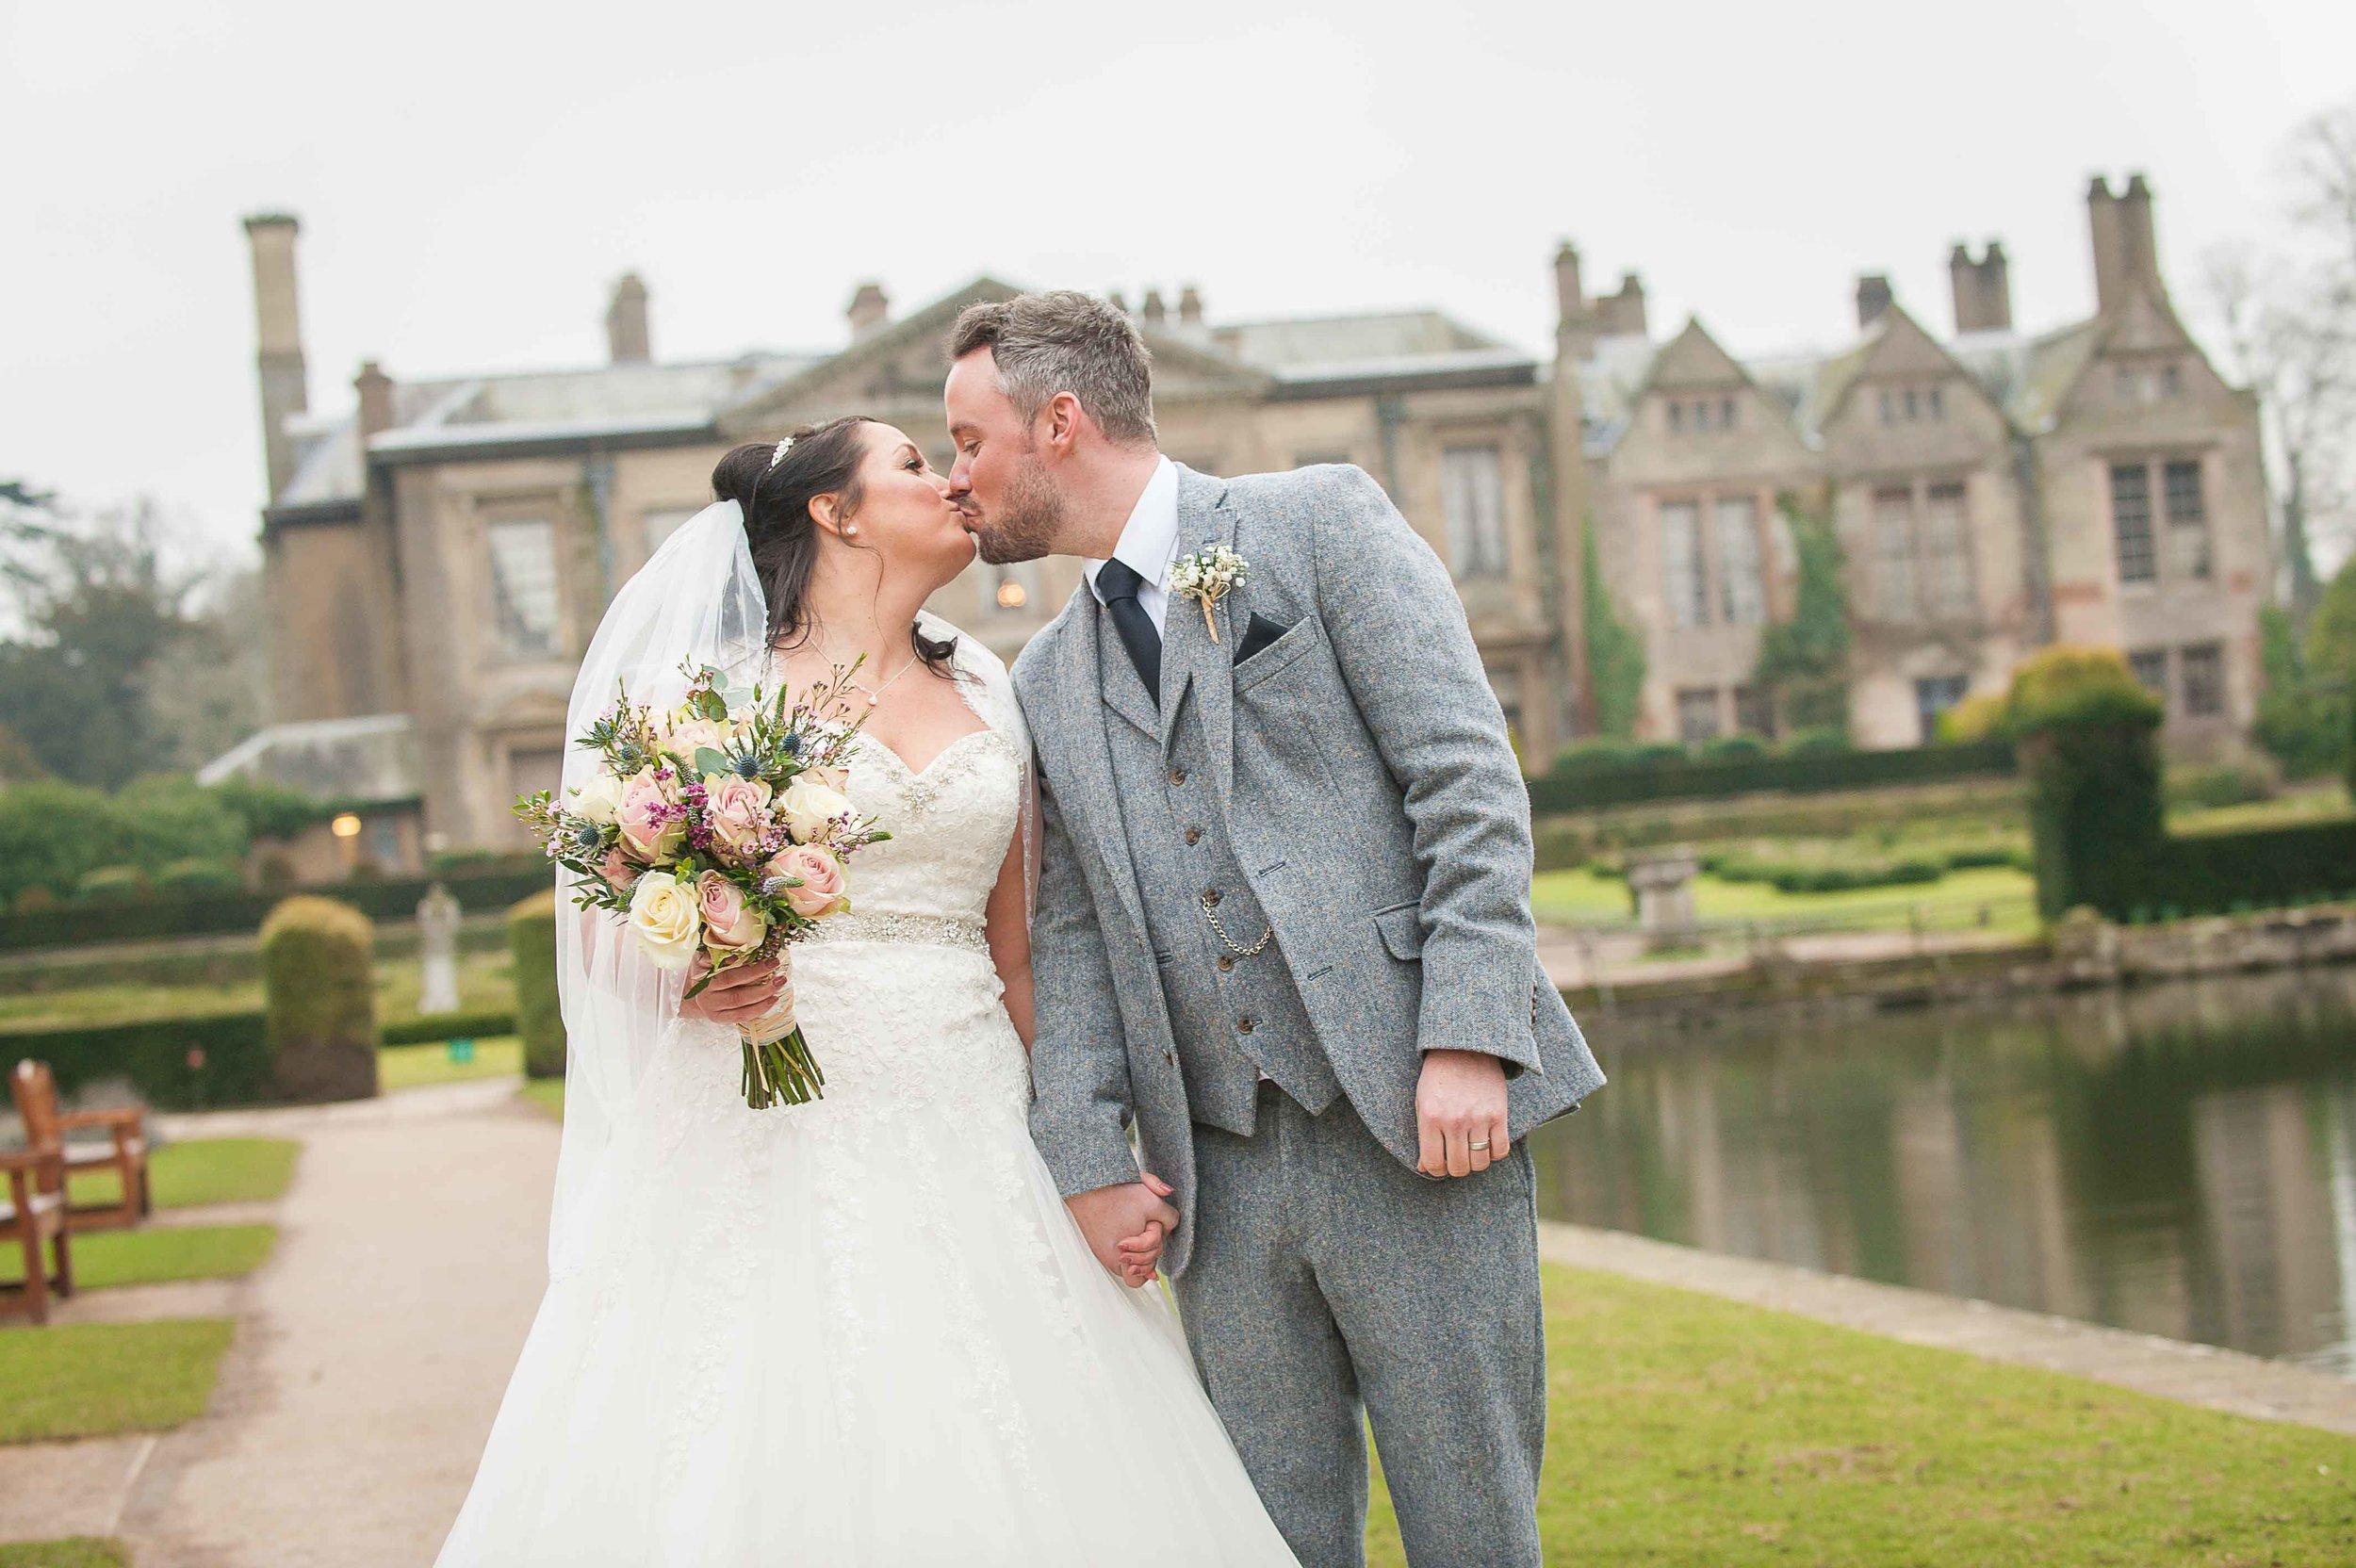 14.02.17 - Matt-Faye-Coombe-Abbey-Valentine-Wedding-Charnwood-Photography-1068.jpg